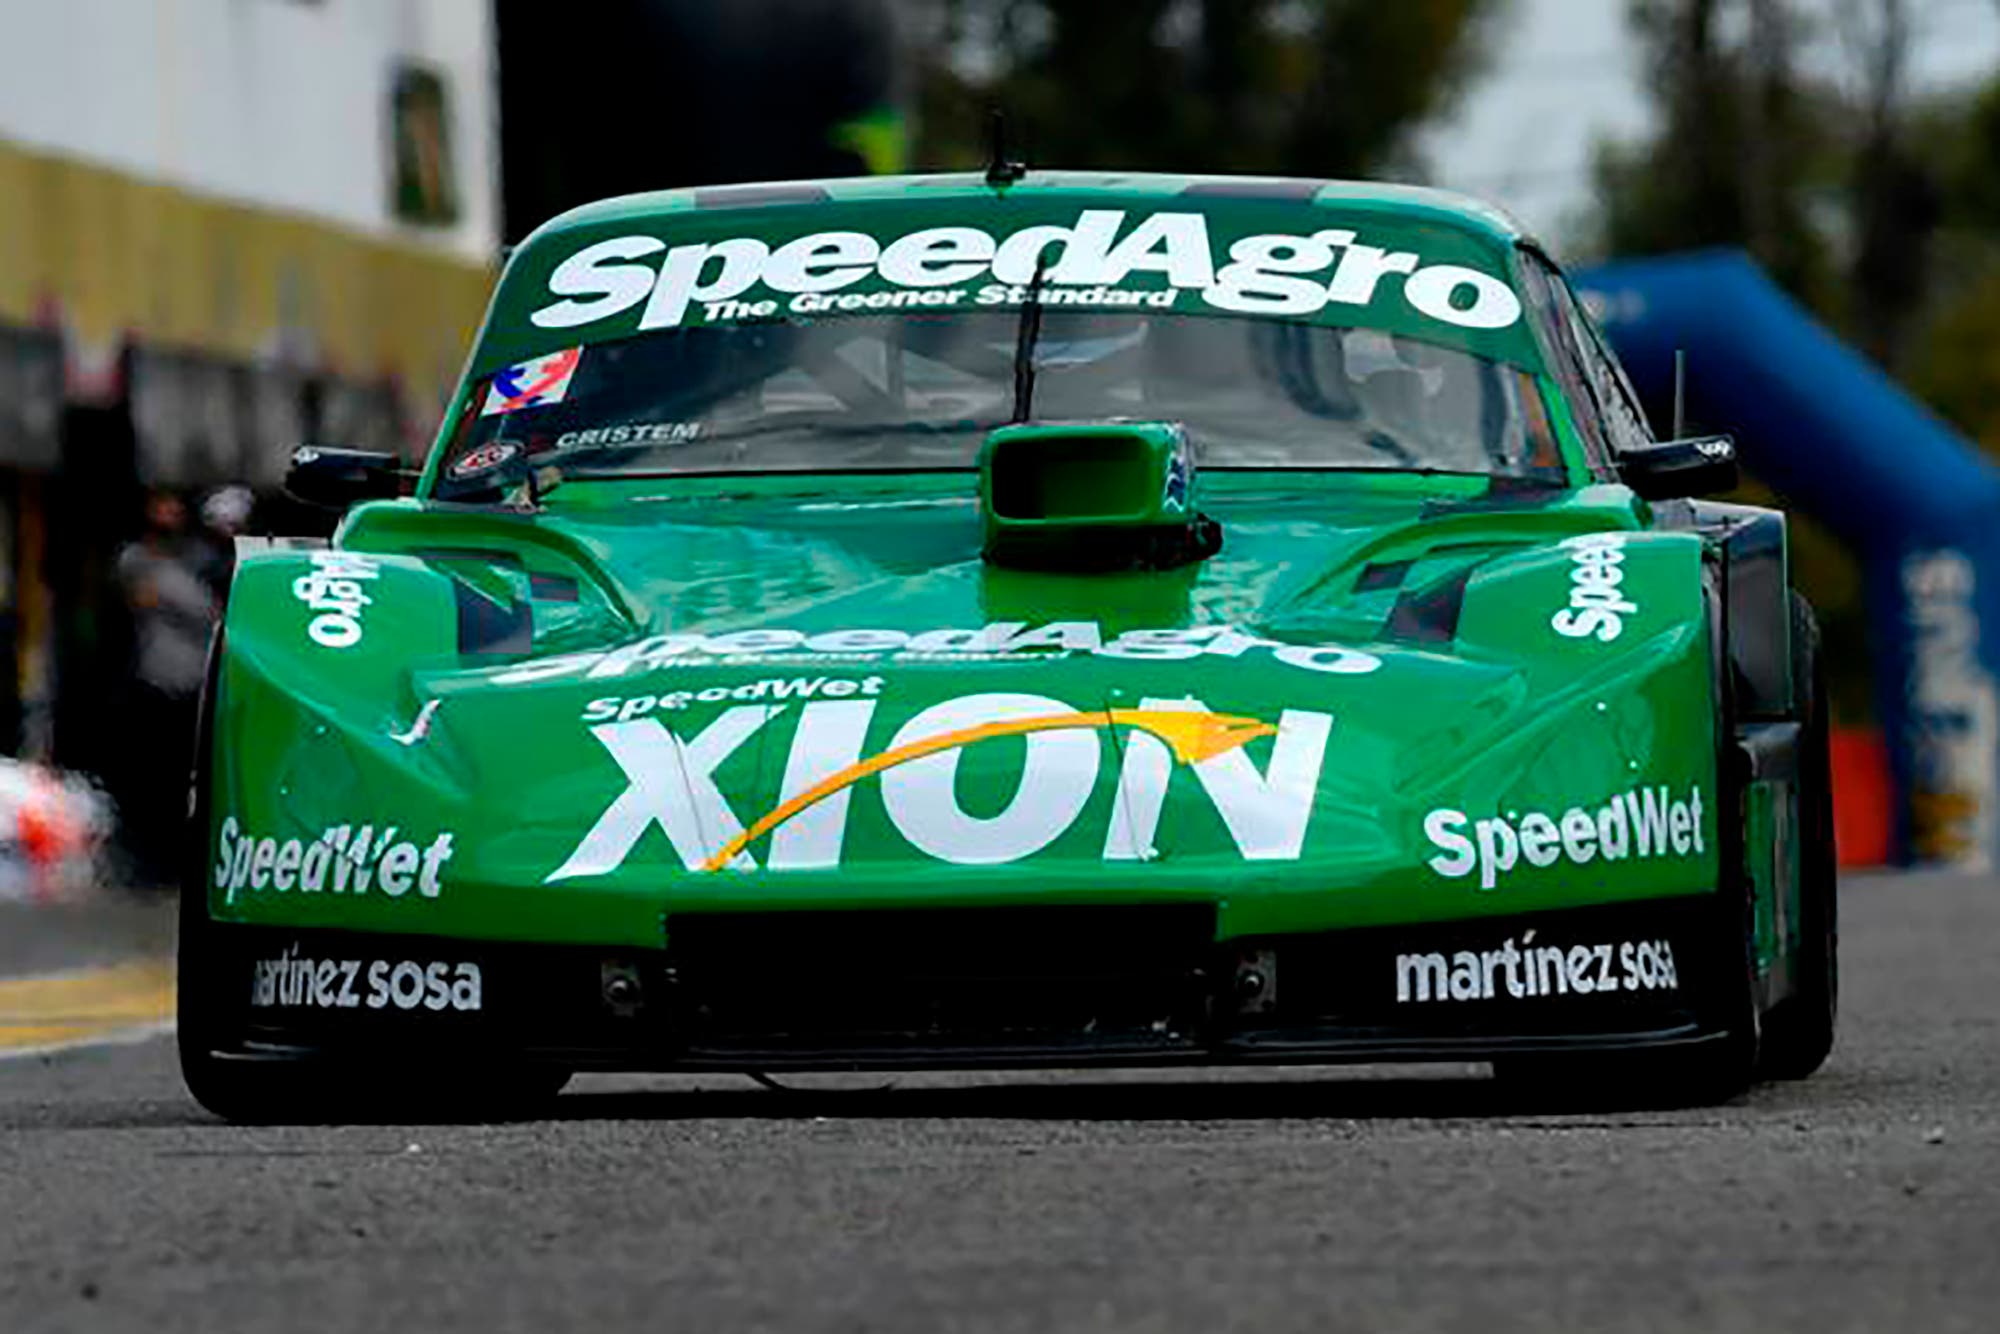 Agustín Canapino quedó primero un sábado, toda una rareza en un supercampeón de Turismo Carretera